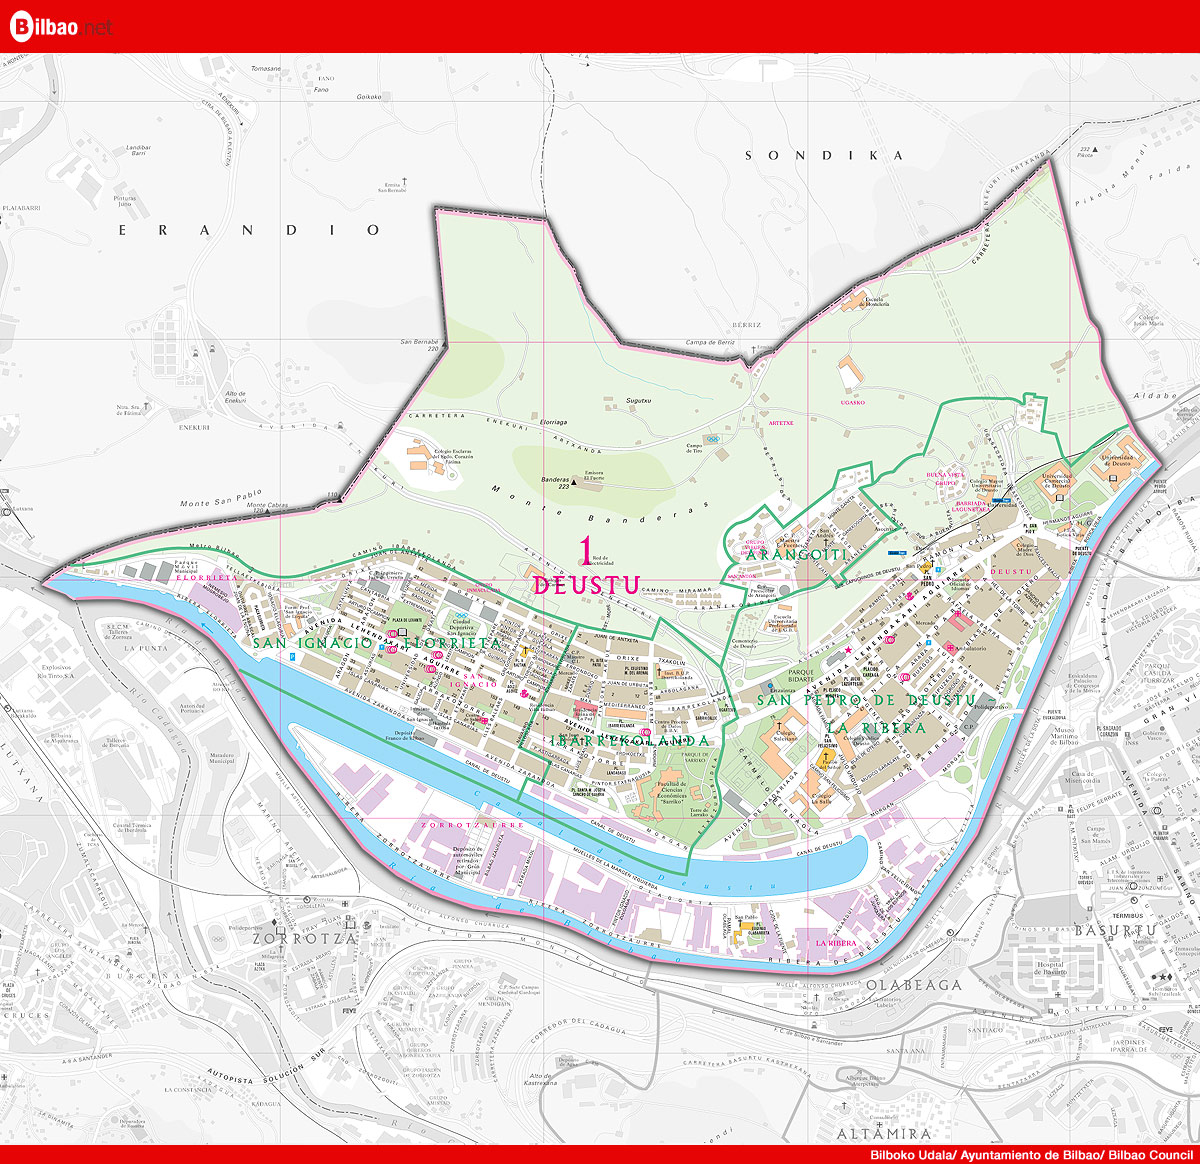 Deusto district